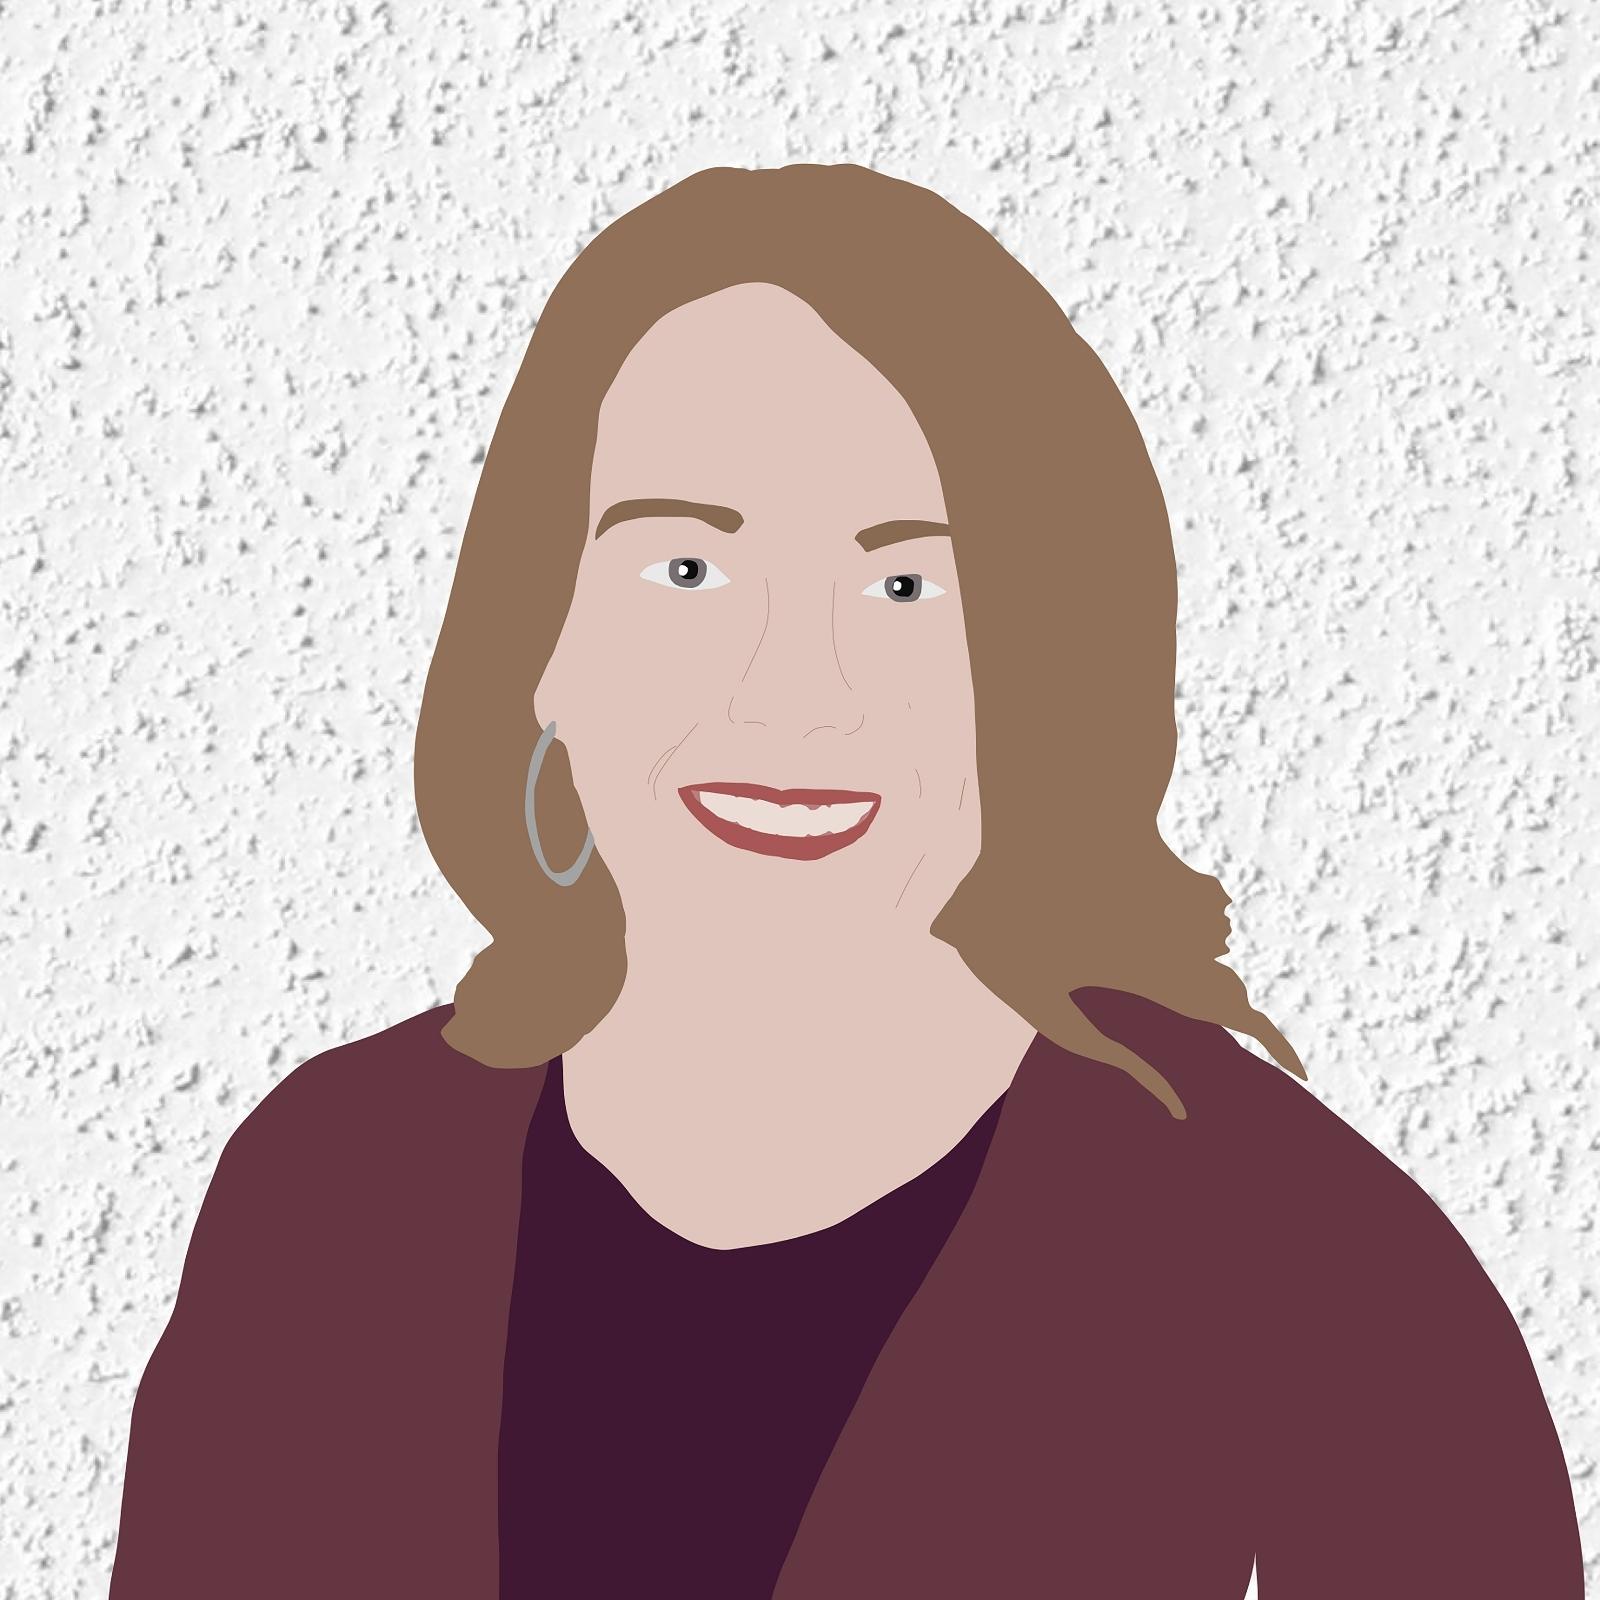 Digital illustration of Ericca smiling against a white stucco background.